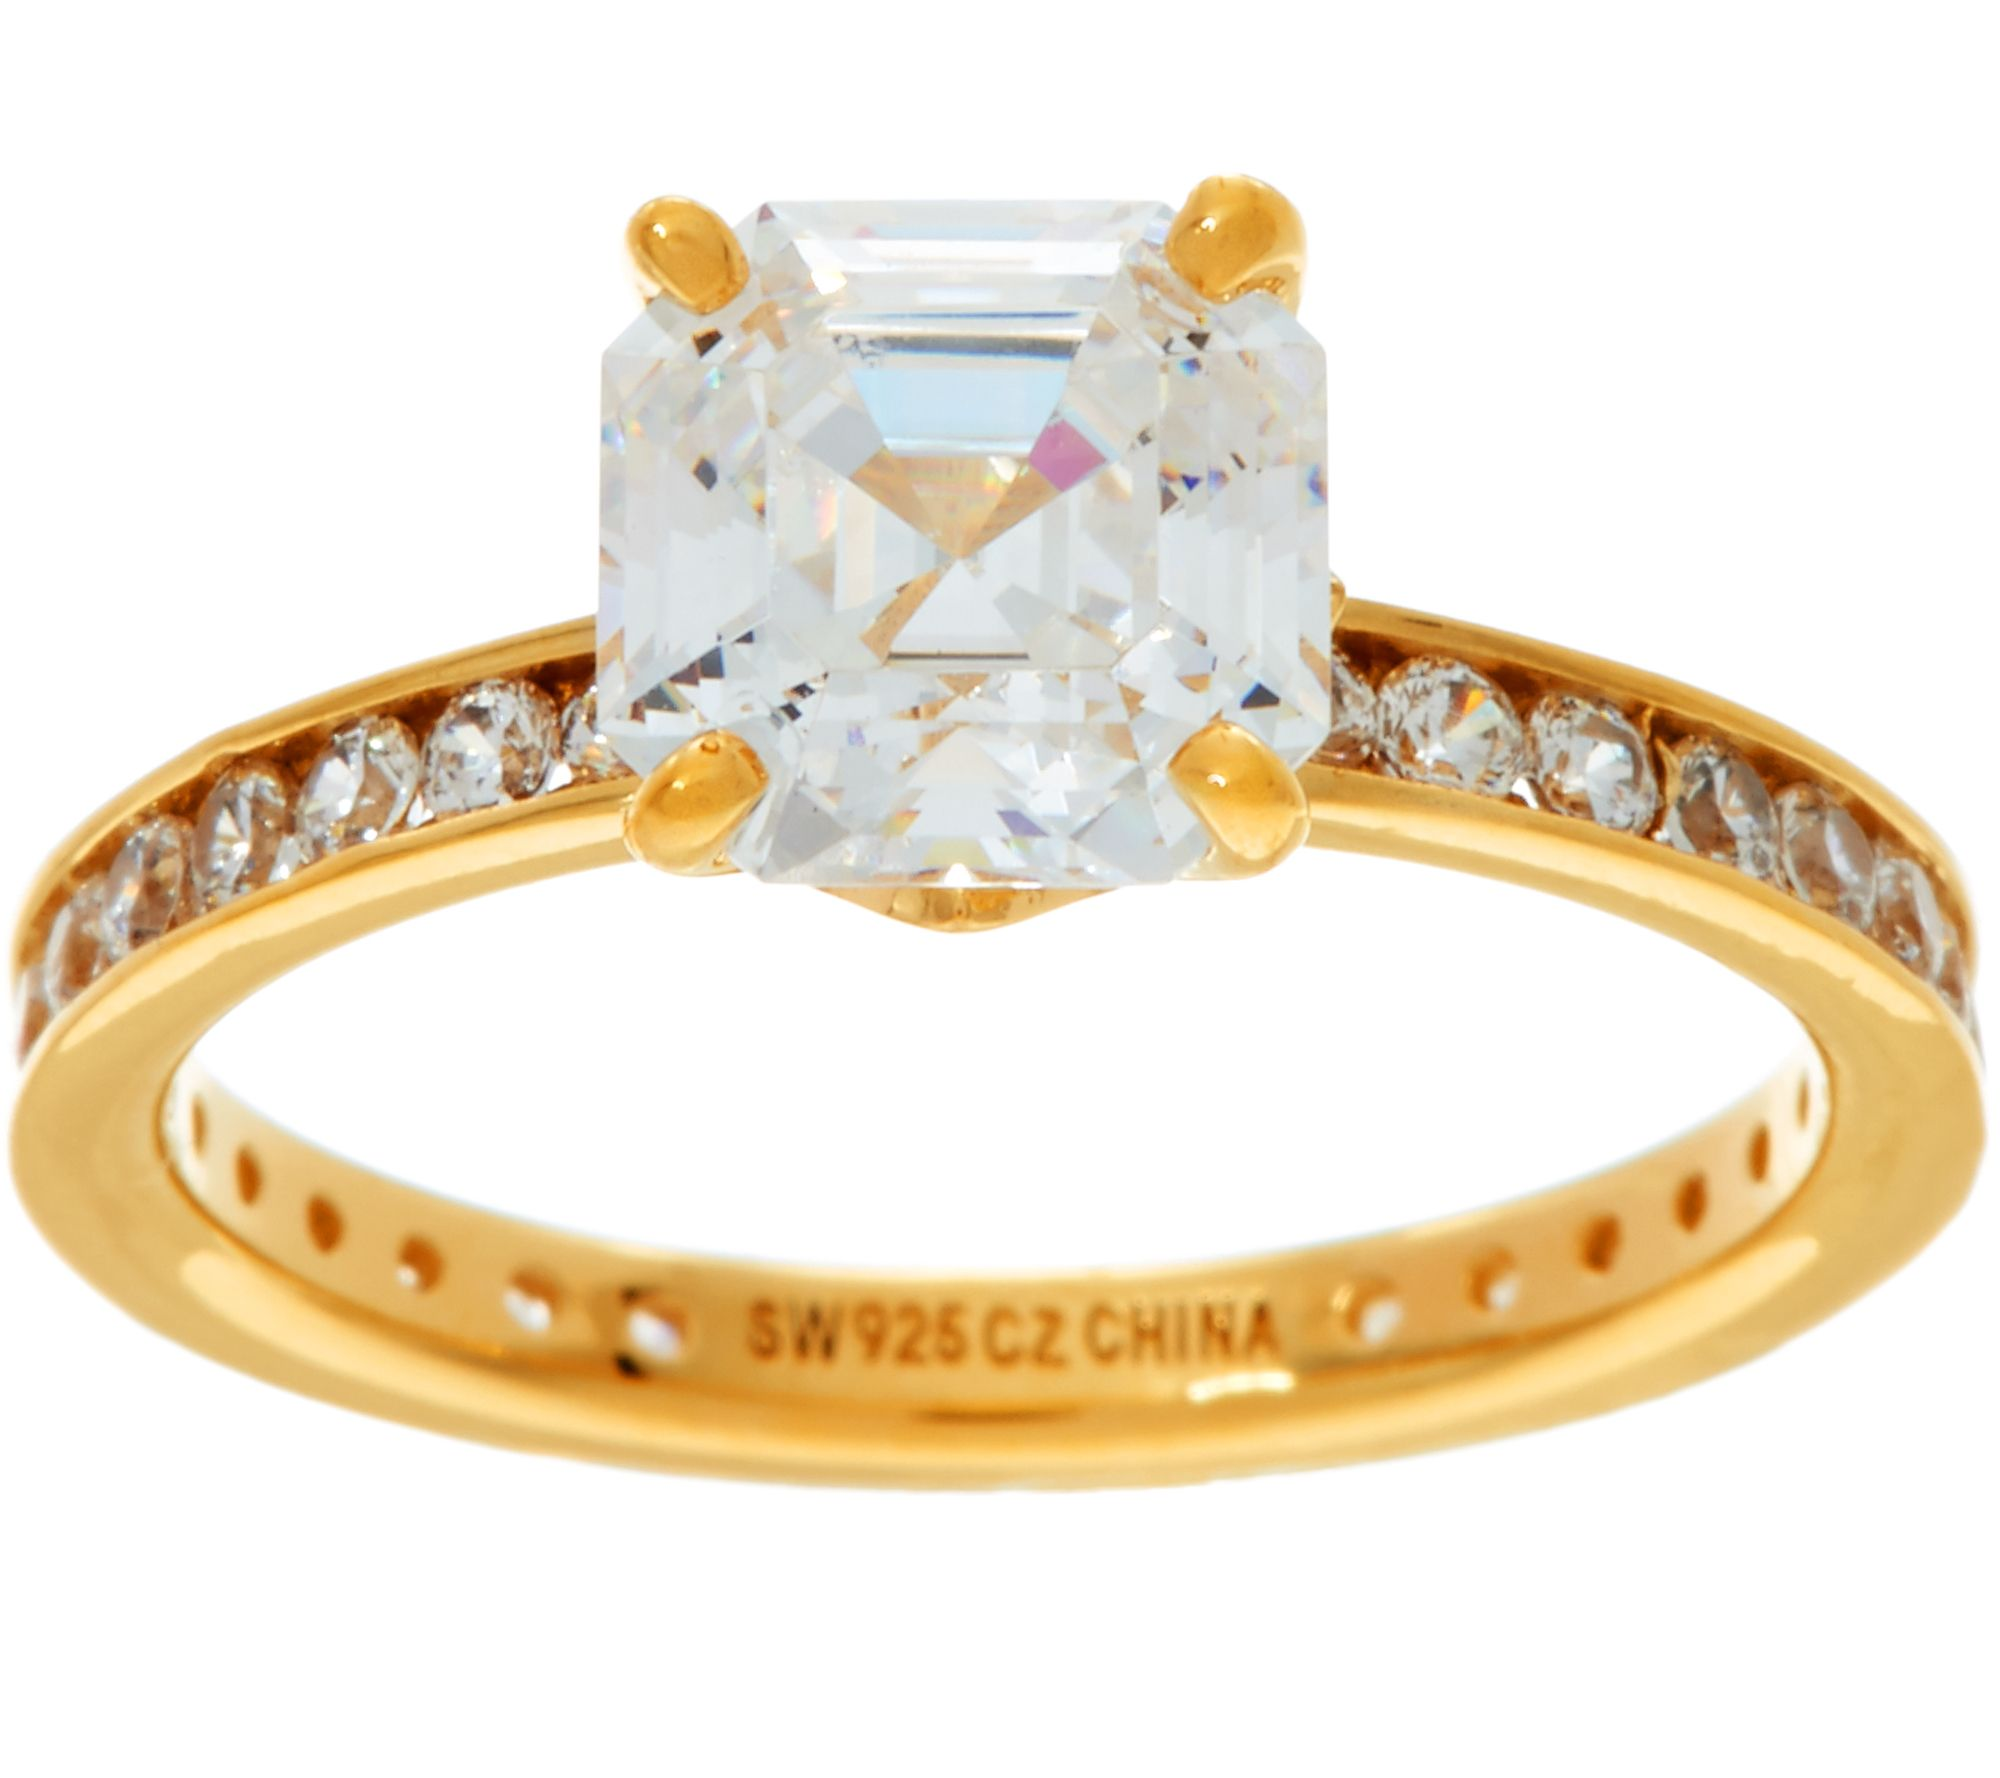 Bridal Classics — Diamonique R Jewelry — Jewelry — QVC